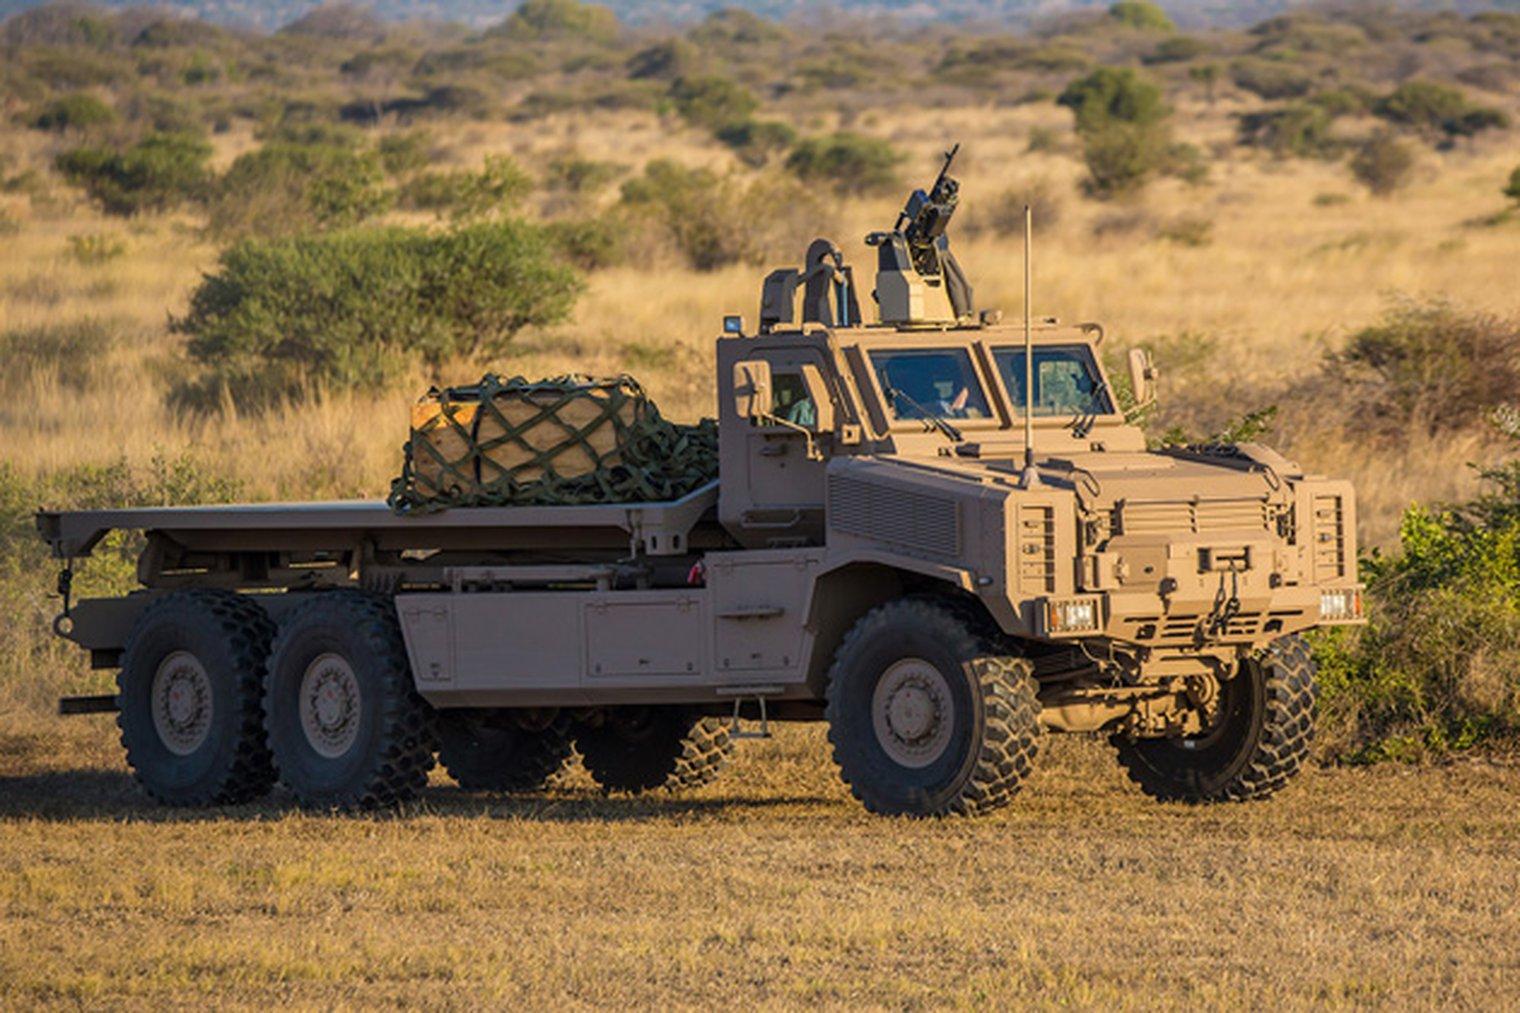 Denel S Africa Truck In Capability Demo Mlf Military